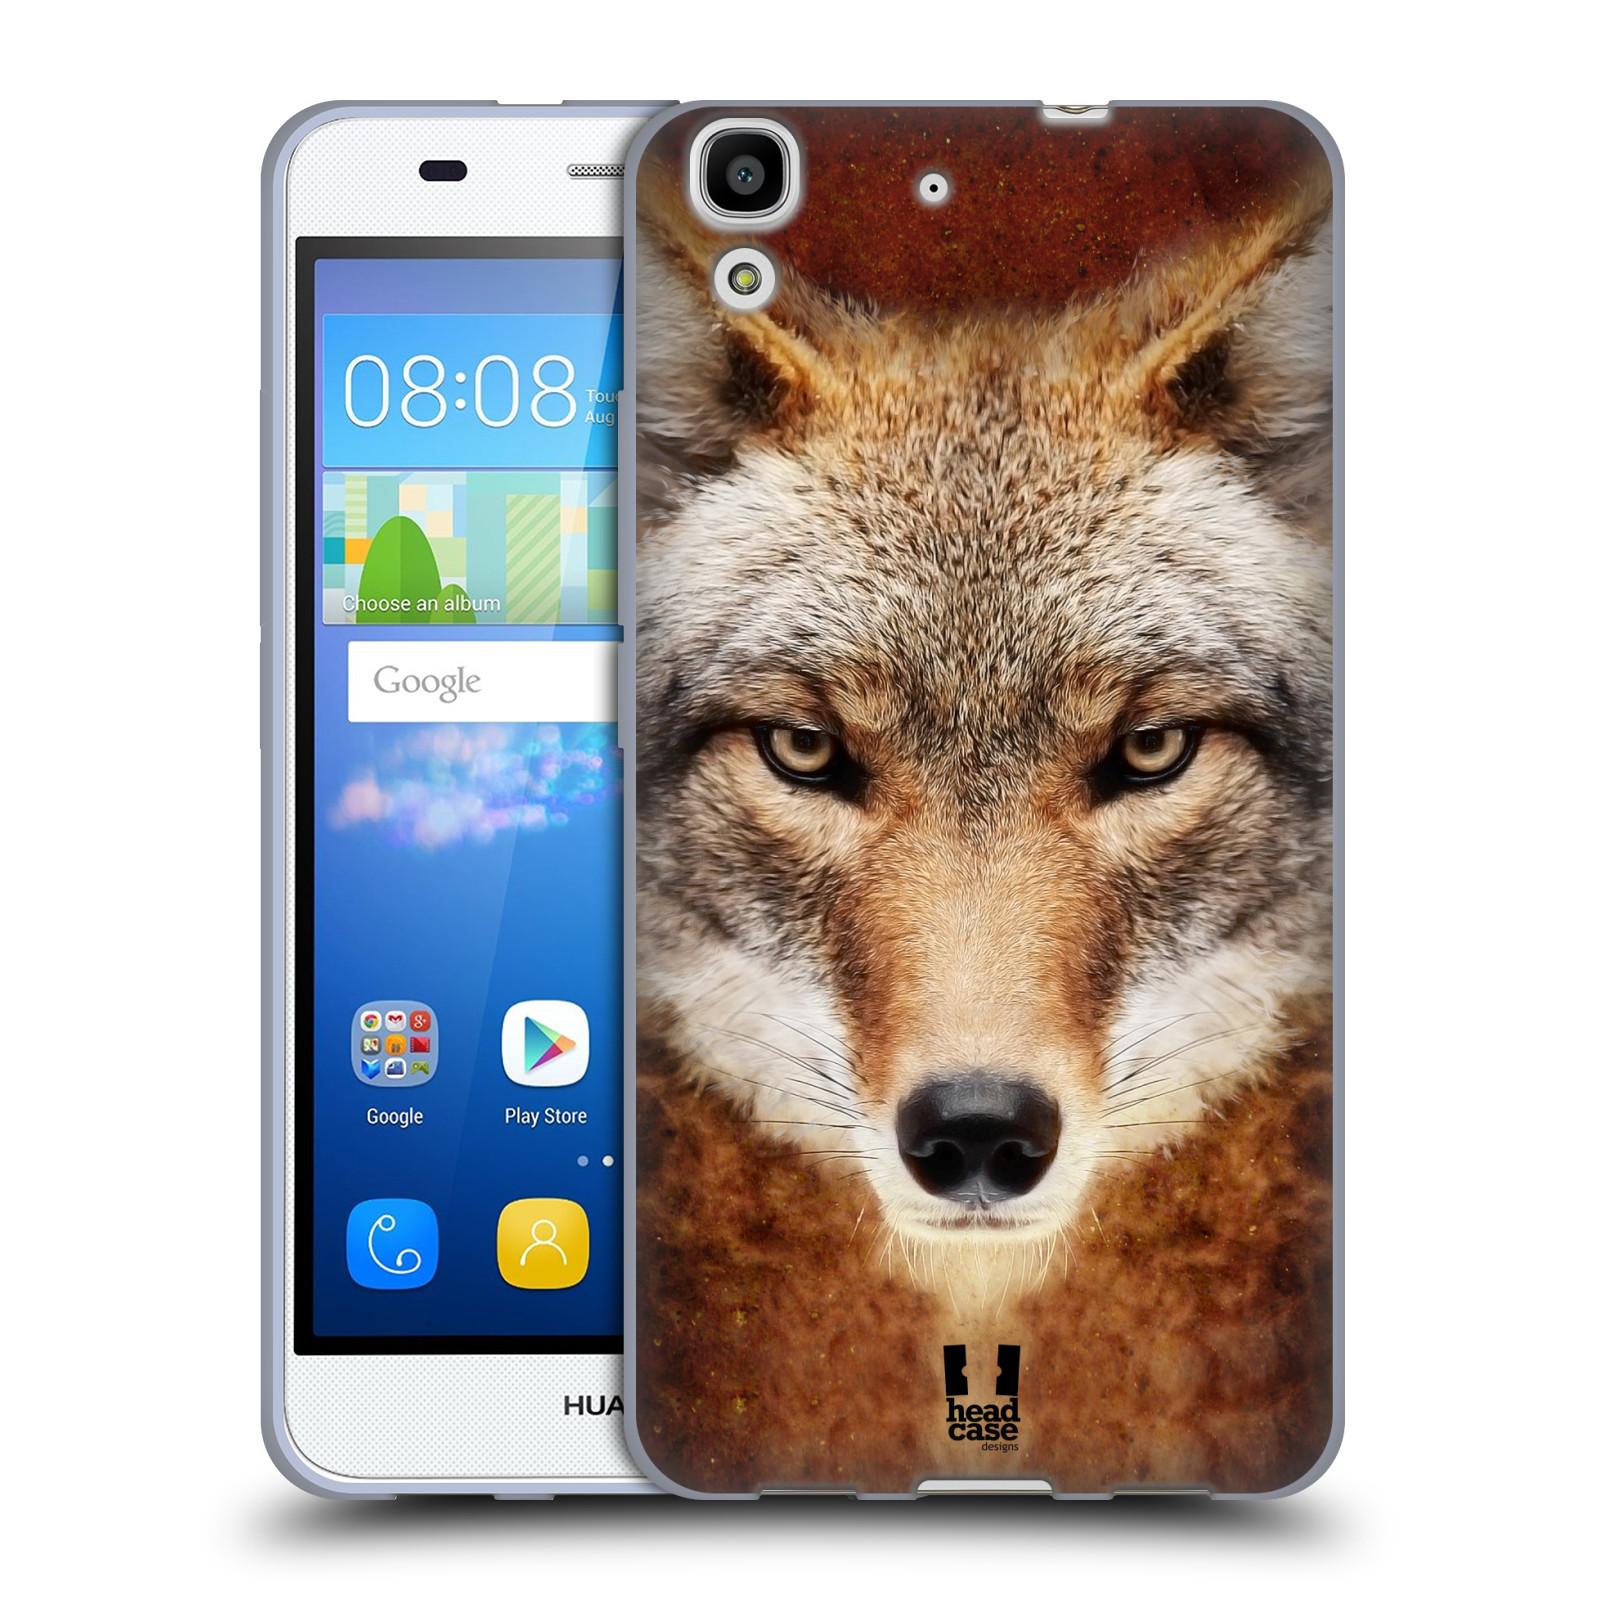 HEAD CASE silikonový obal na mobil HUAWEI Y6 vzor Zvířecí tváře kojot